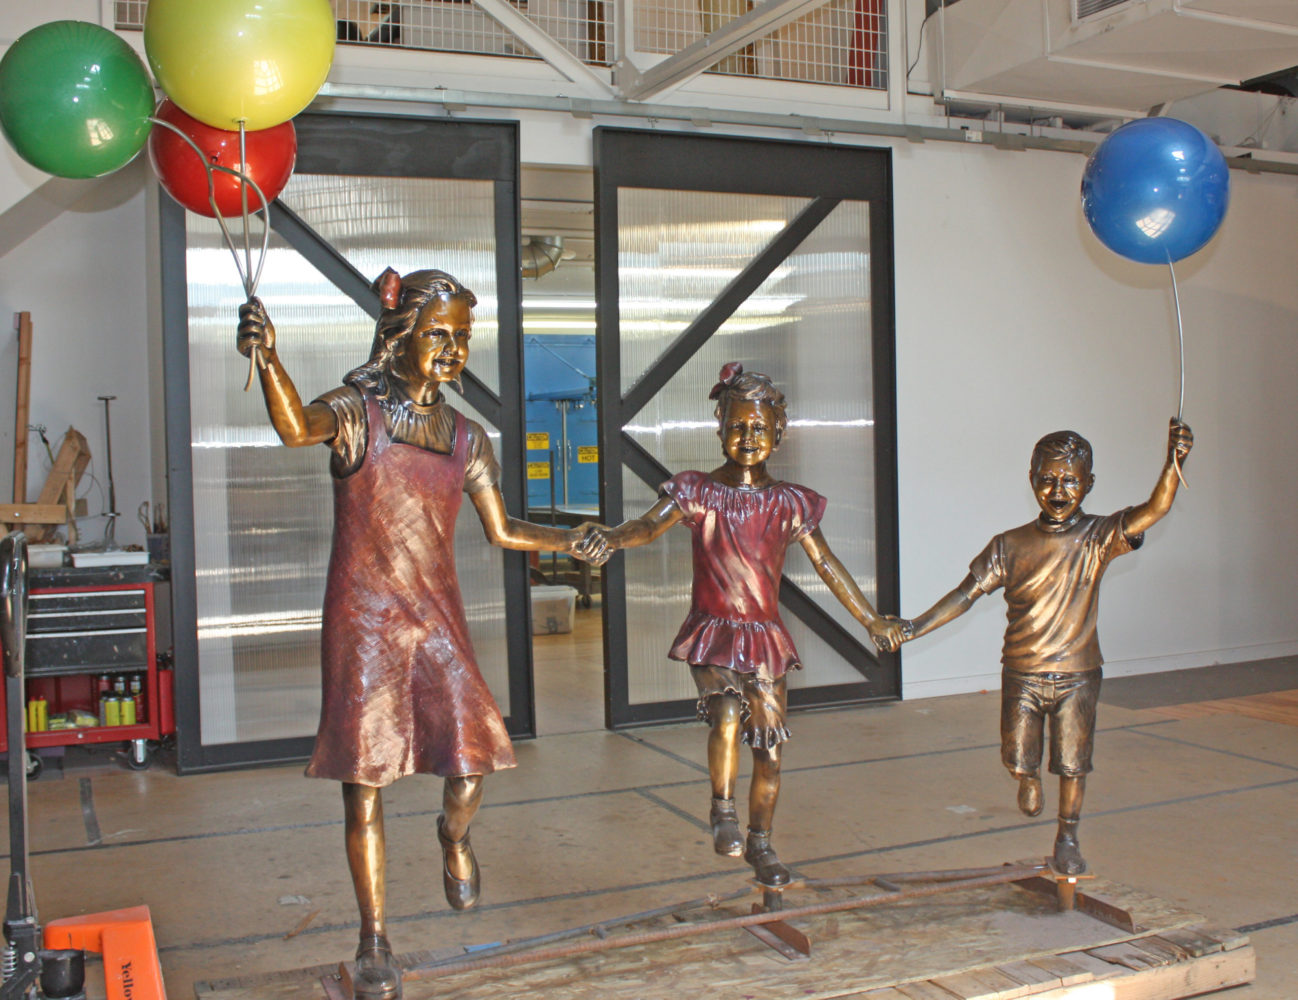 Driscoll Children's Hospital Sculptures